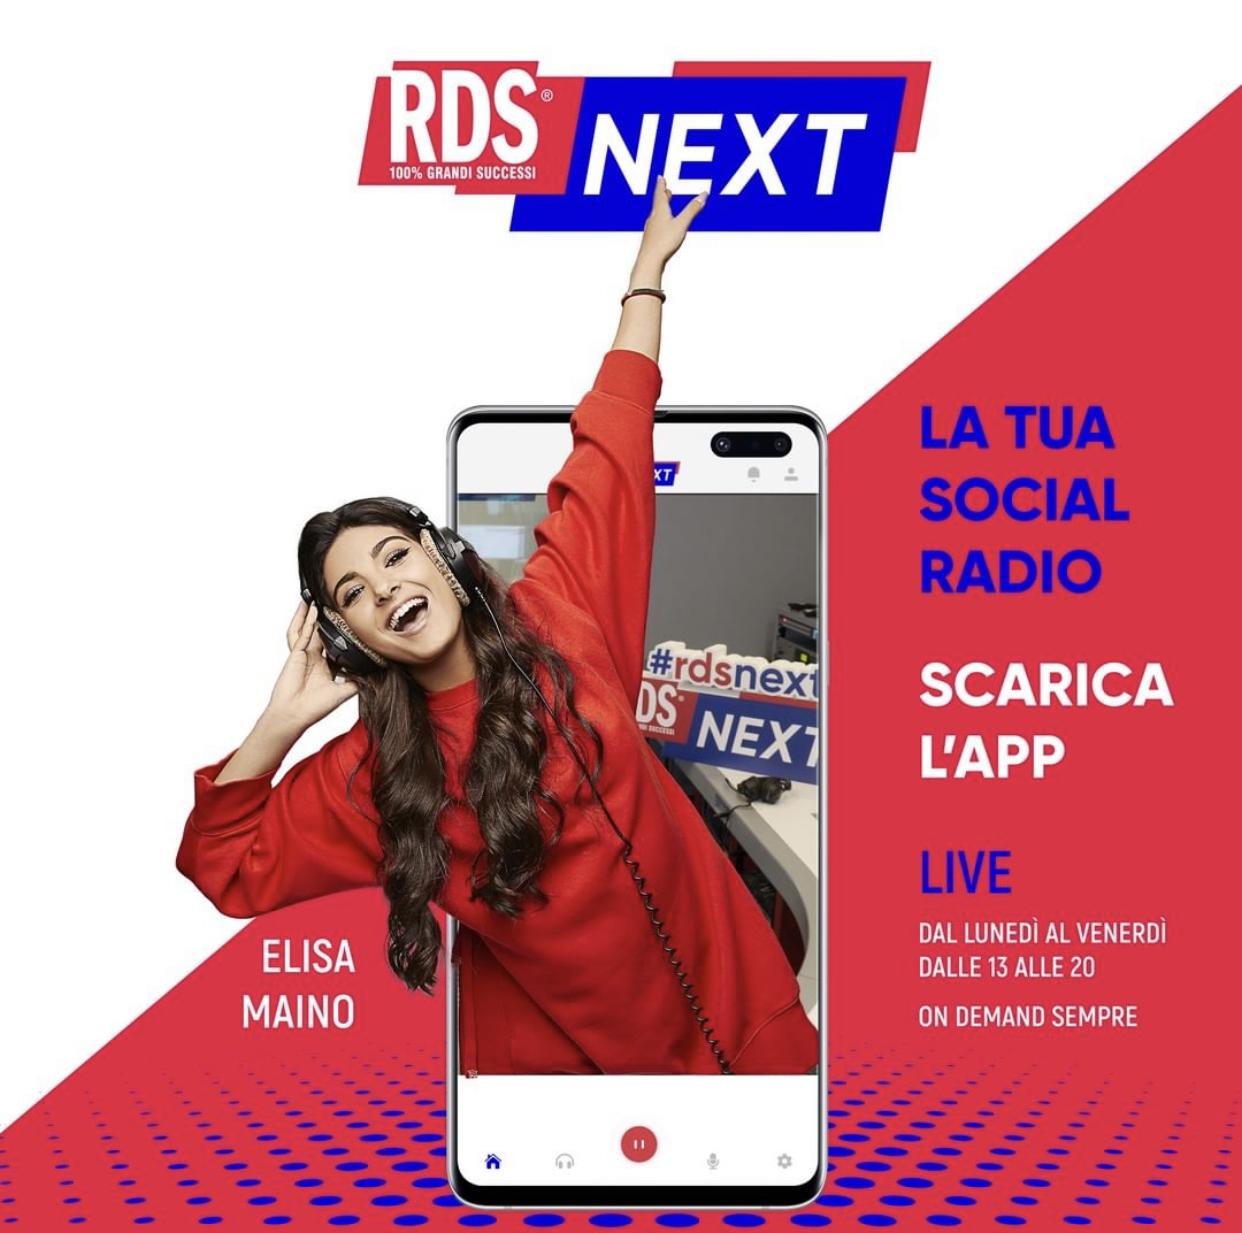 RDS NEXT - ELISA MAINO